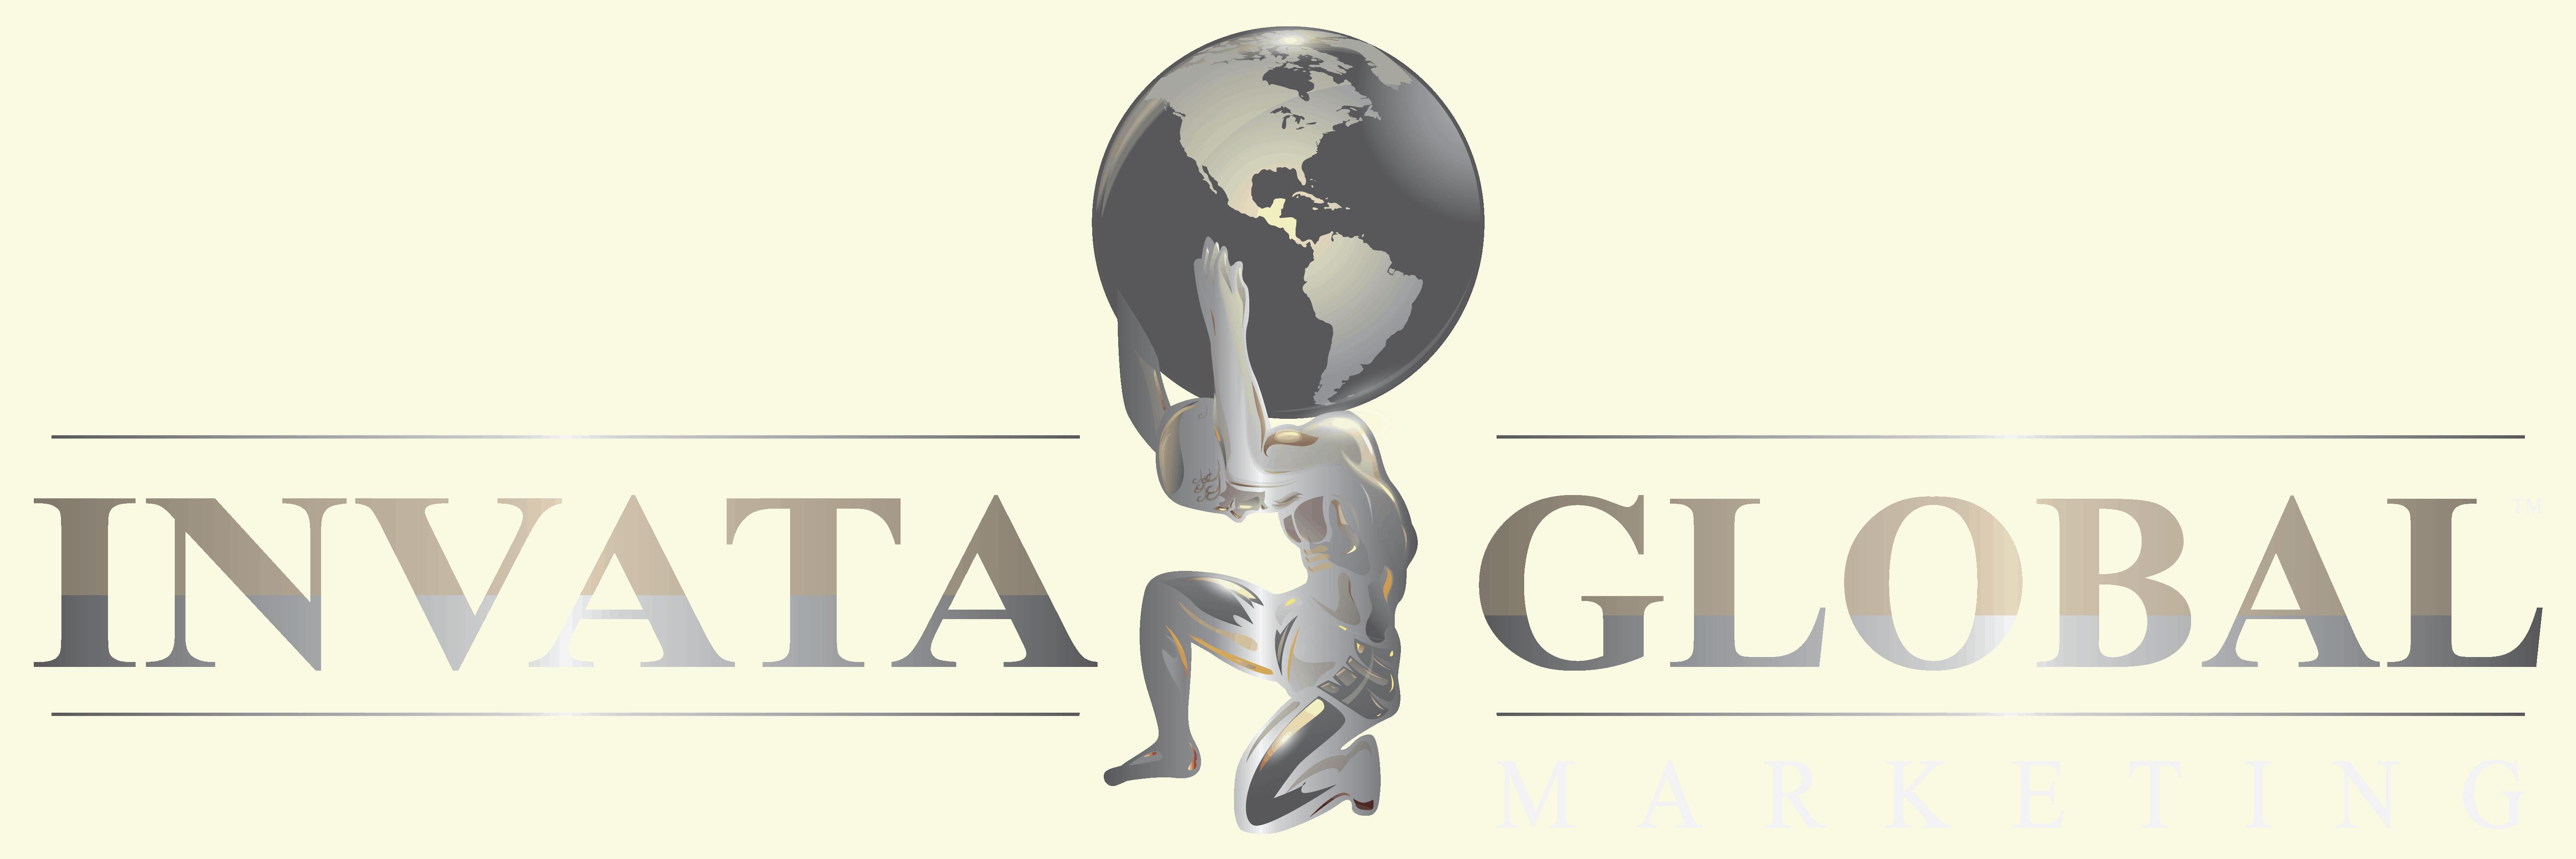 Invata Global Marketing logo